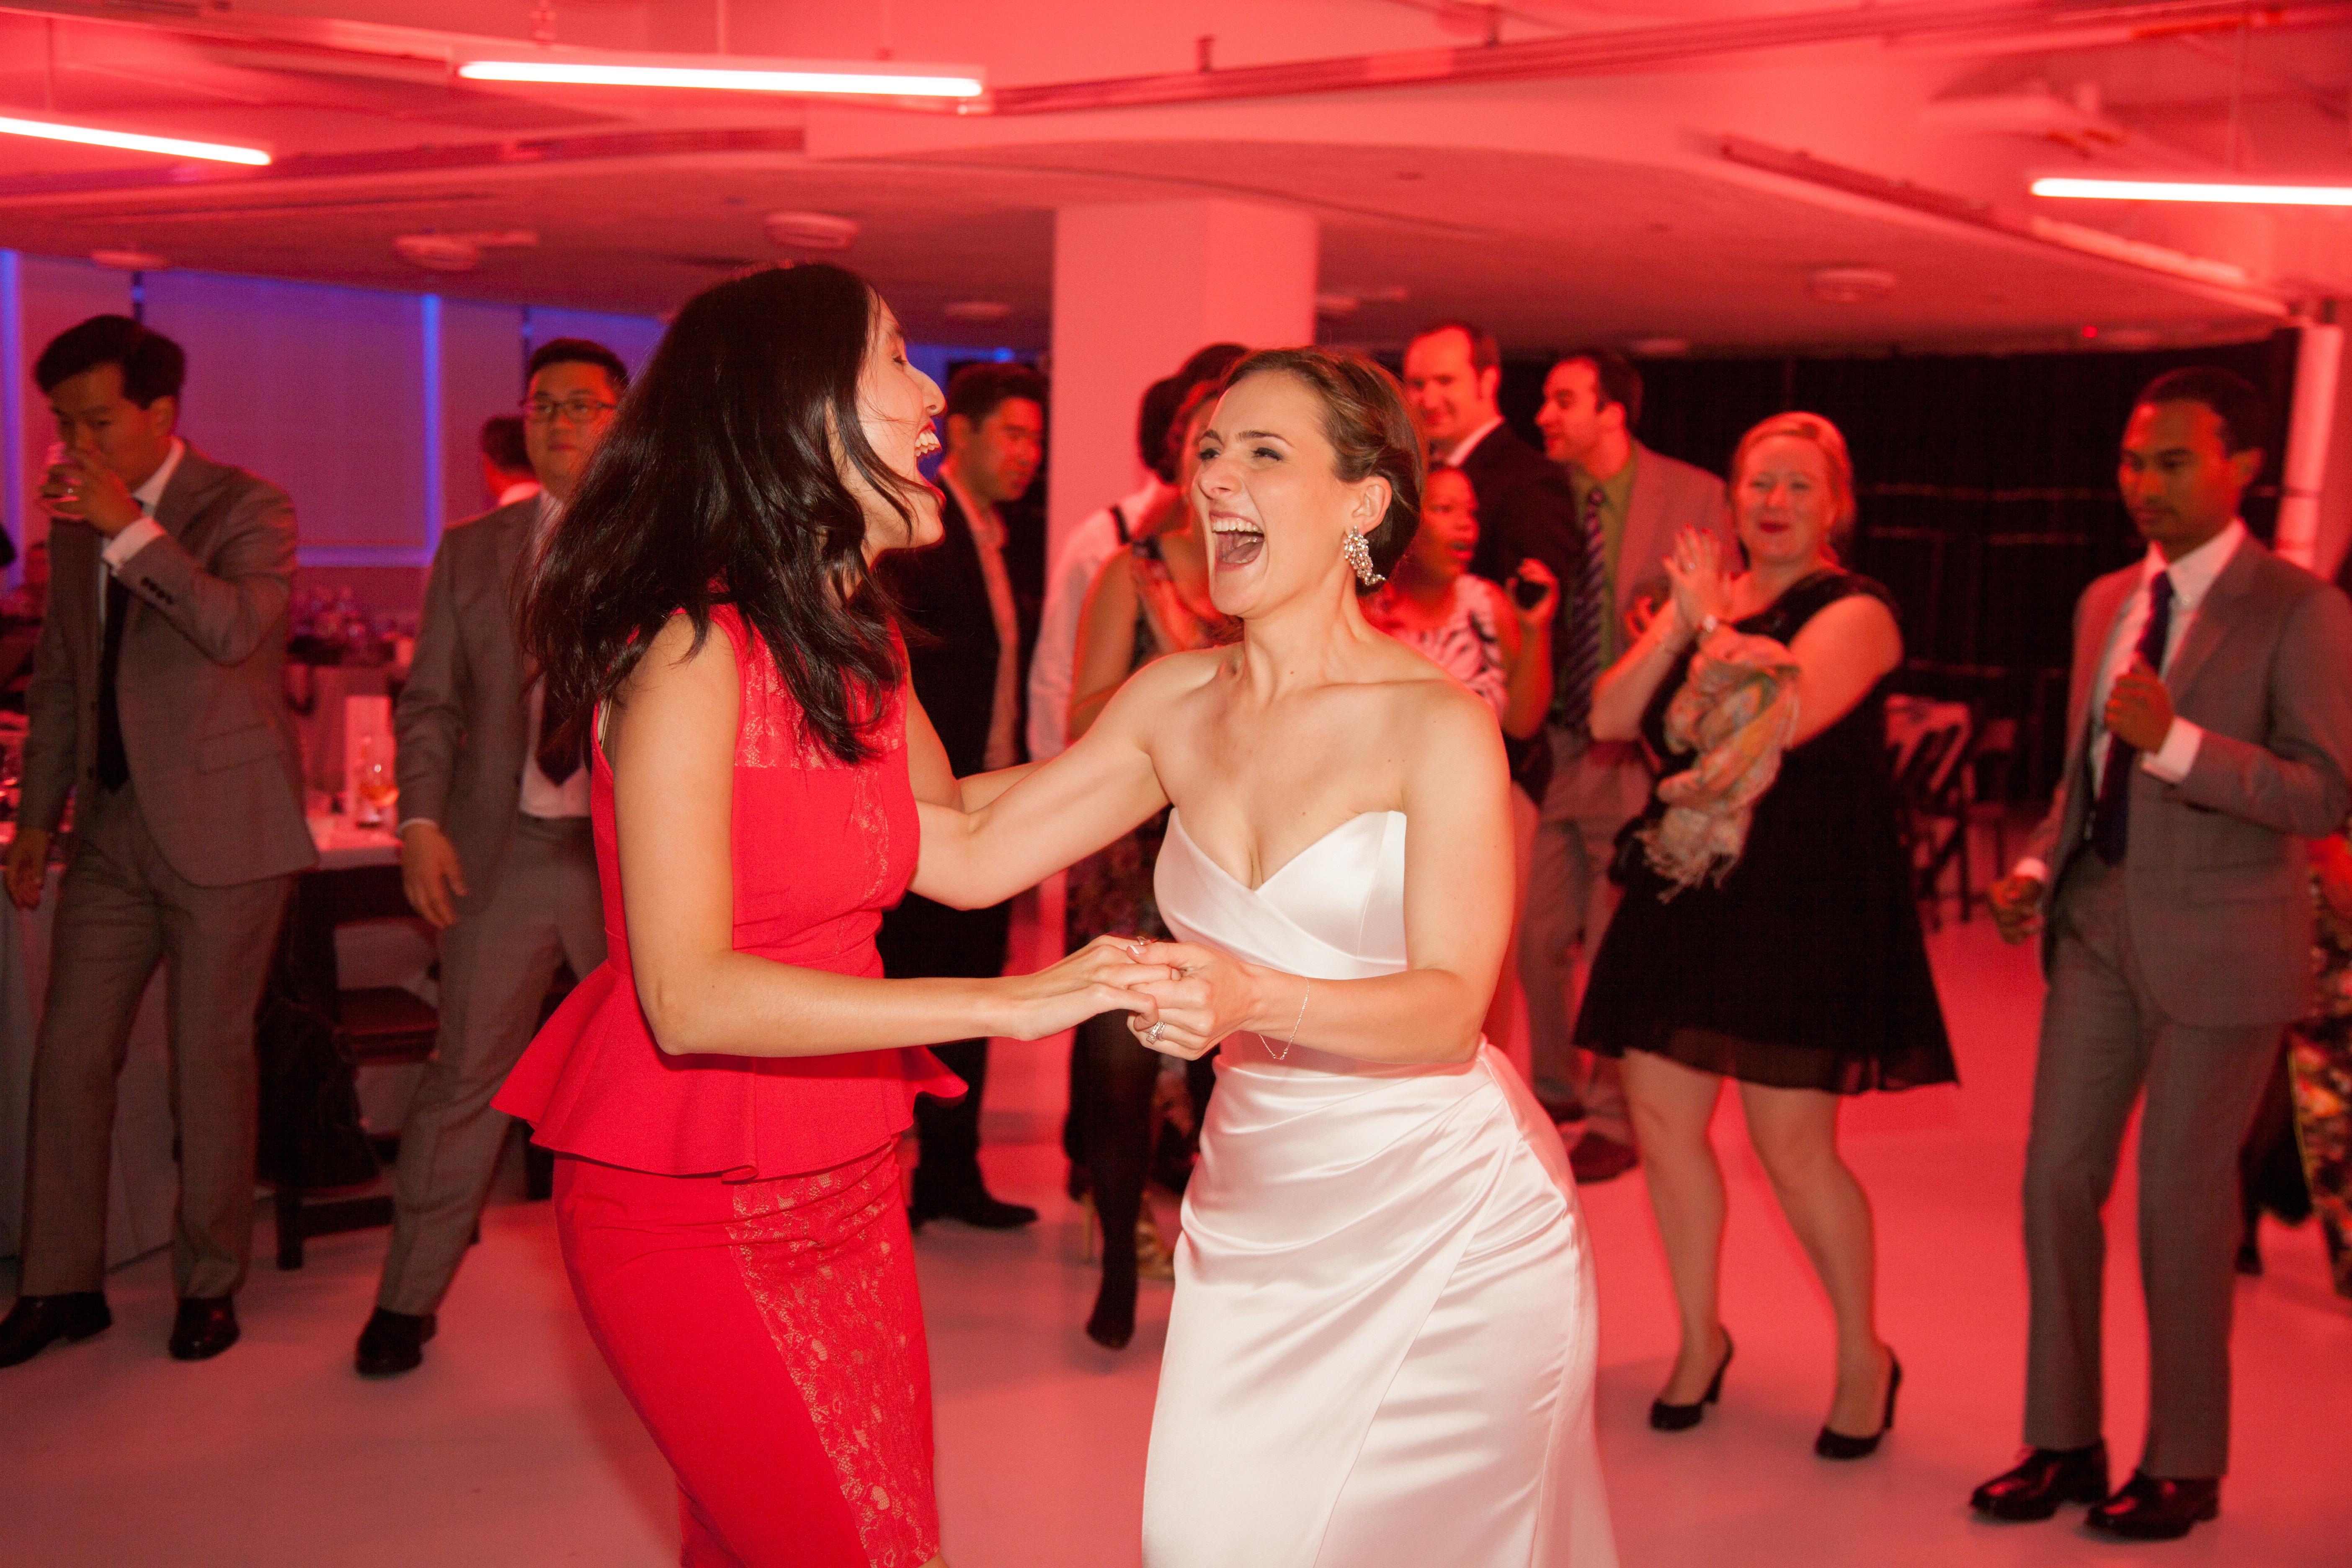 Wedding Ballroom dancers